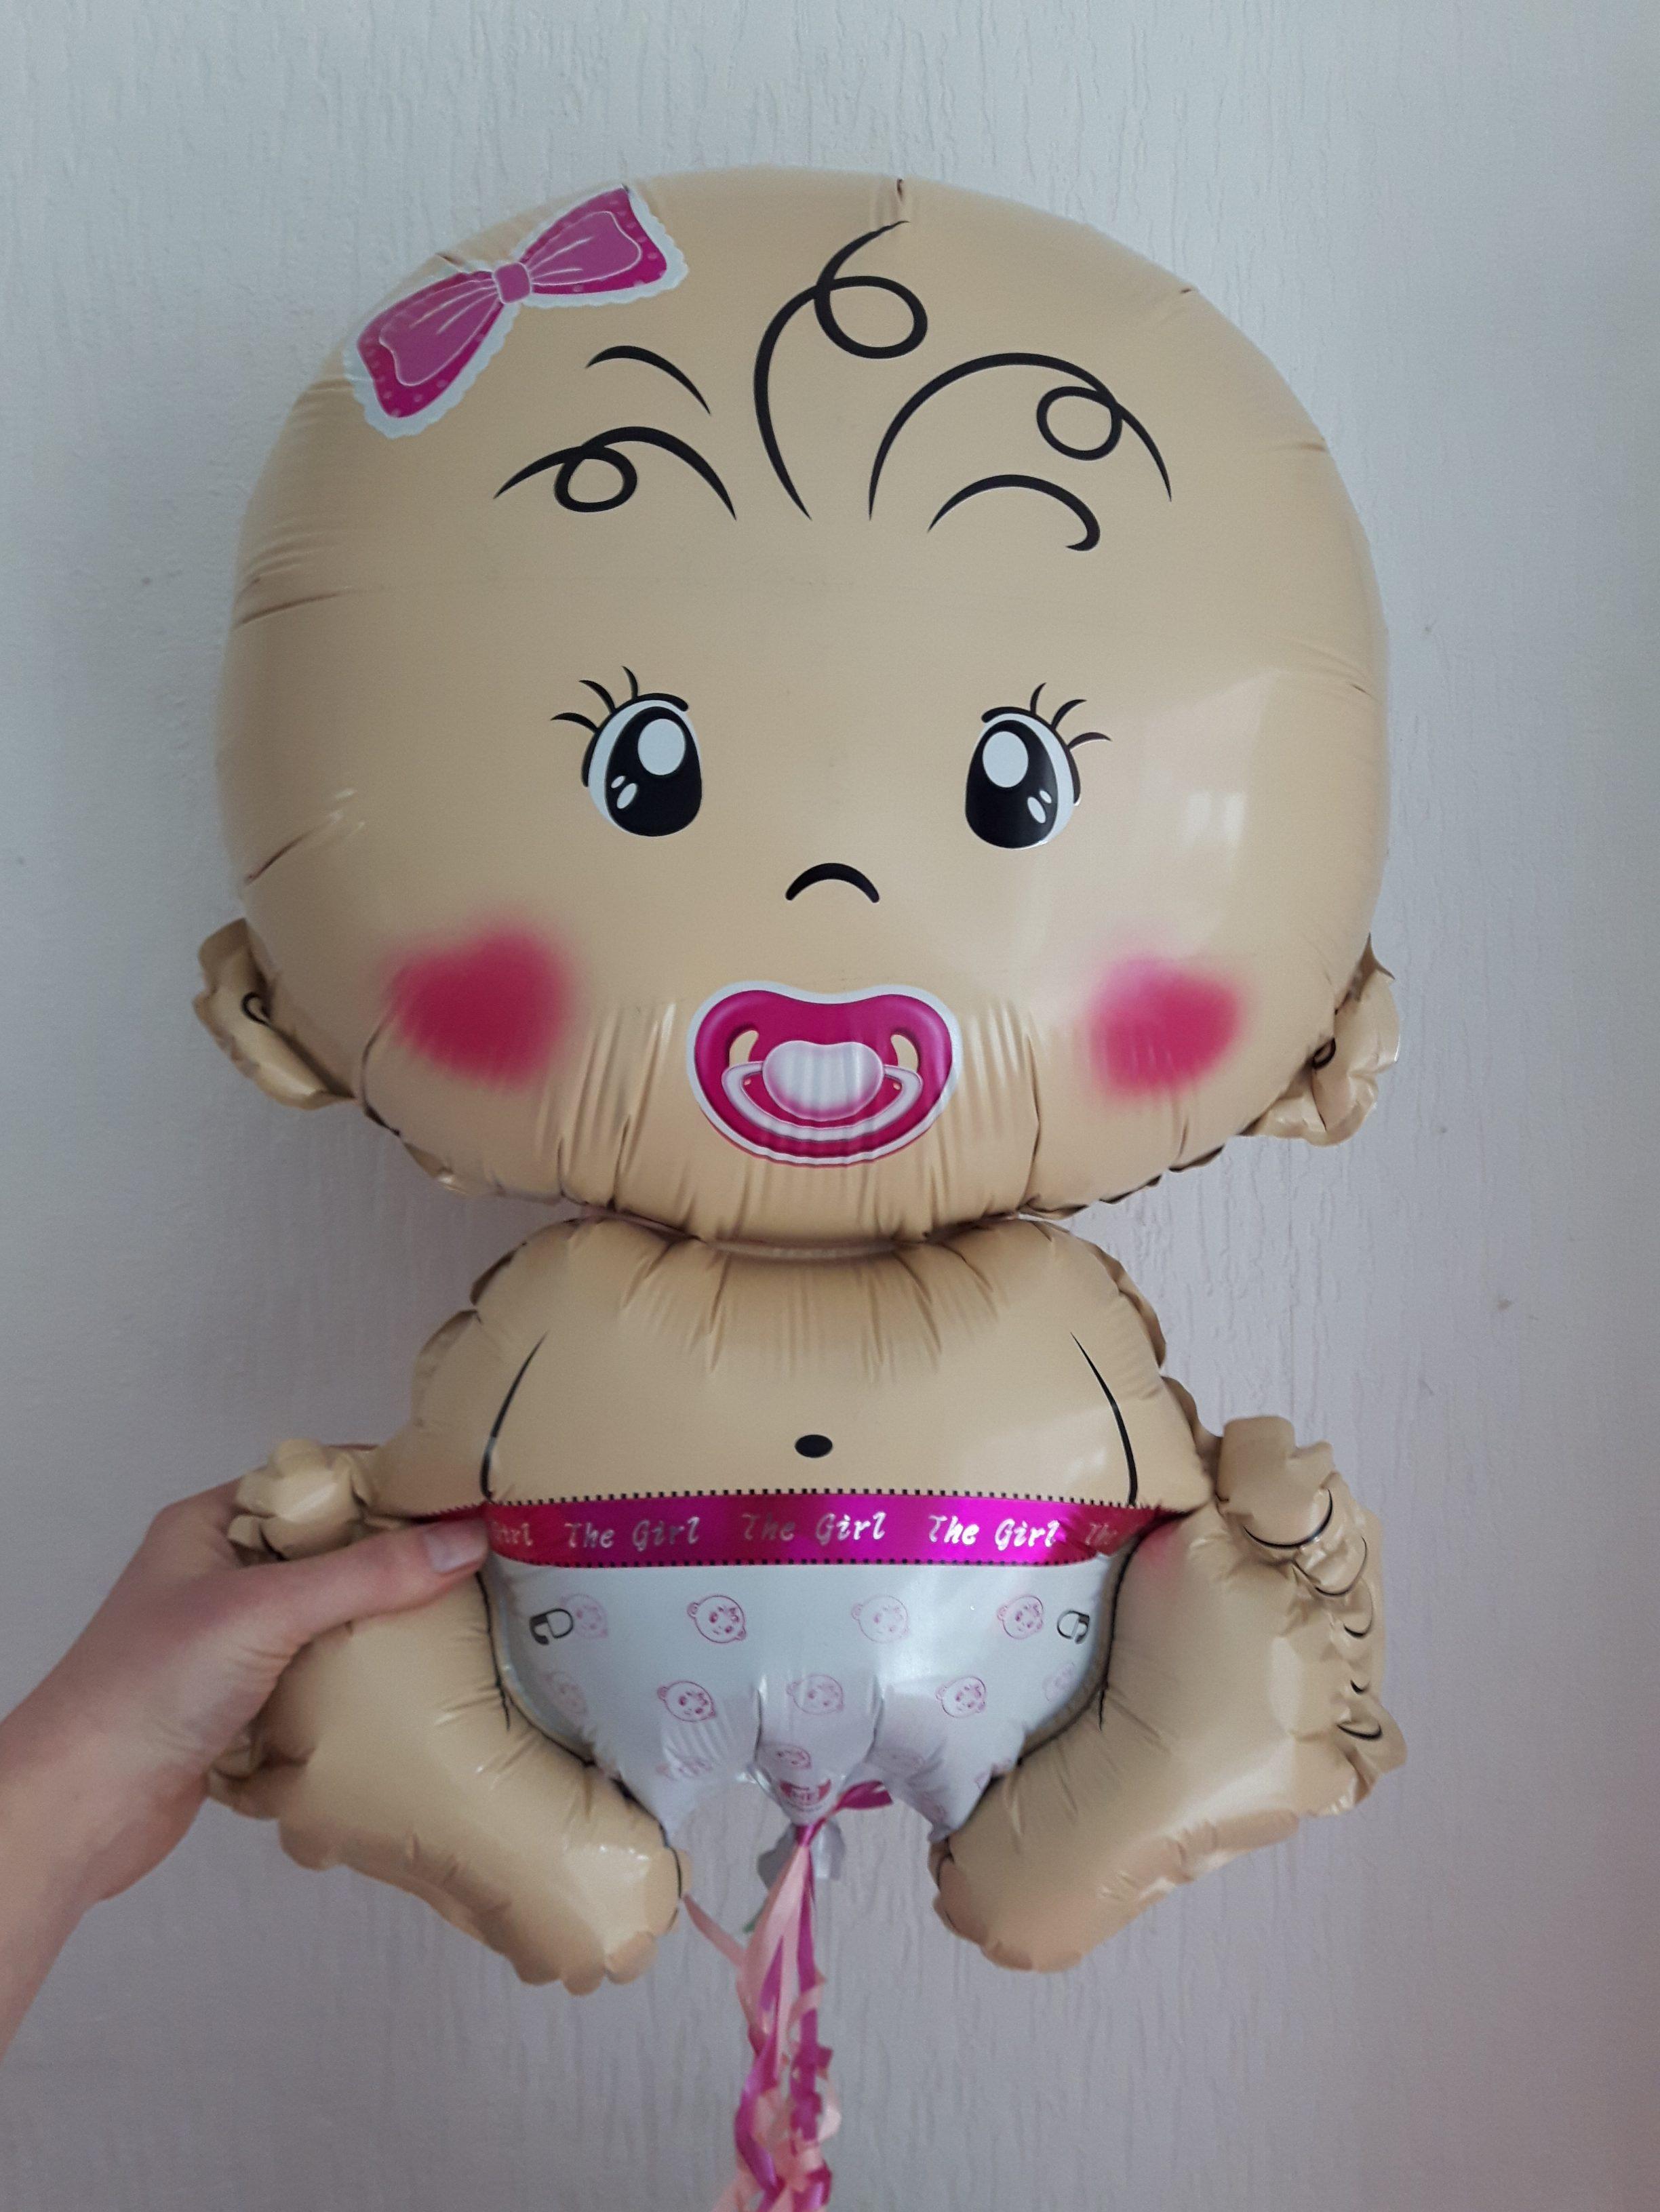 Spullen Voor Babyshower.Babyshower 3 Babyshower Decoratie Kaboutertuin